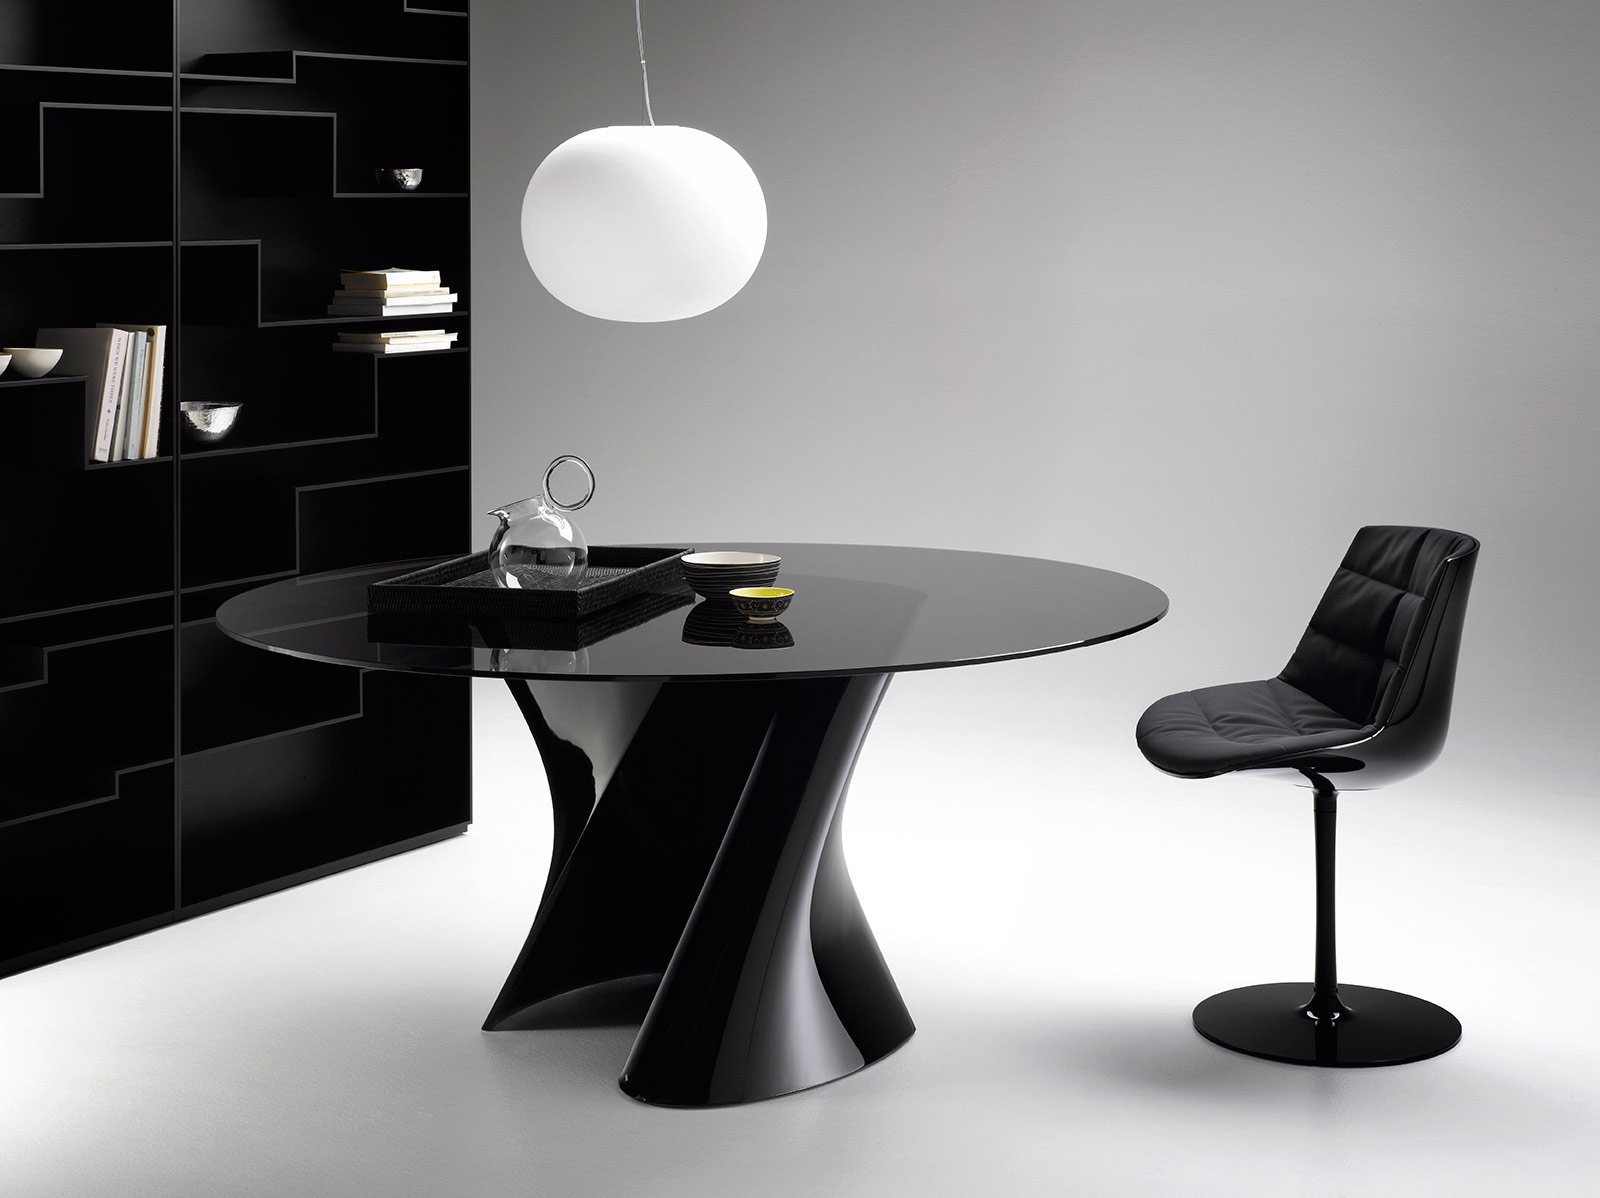 tavoli rotondi e ovali: design morbido, minimal, dinamico - cose ... - Tavoli Rotondi Allungabili Bianchi